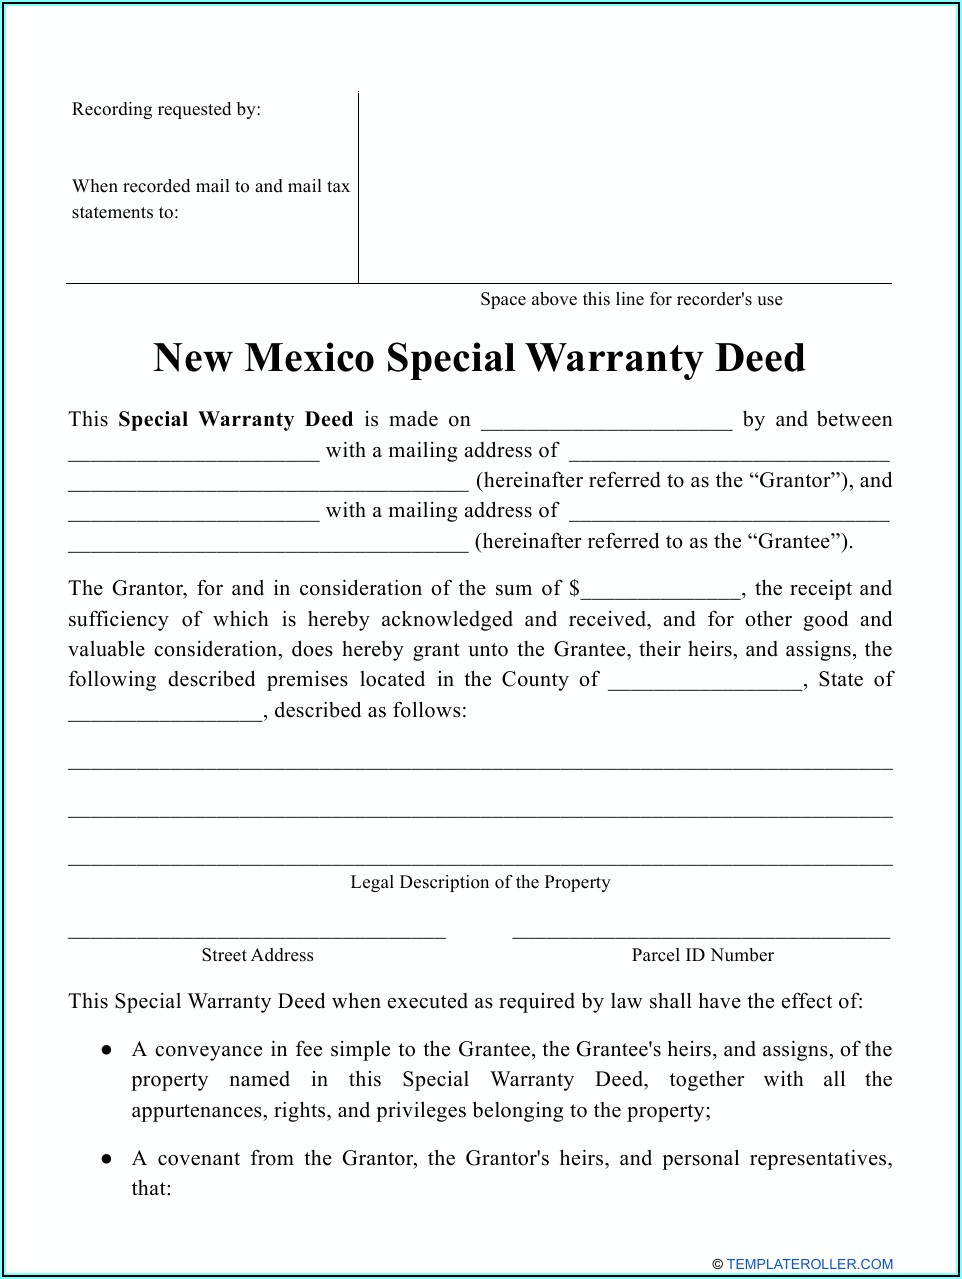 New Mexico Special Warranty Deed Form